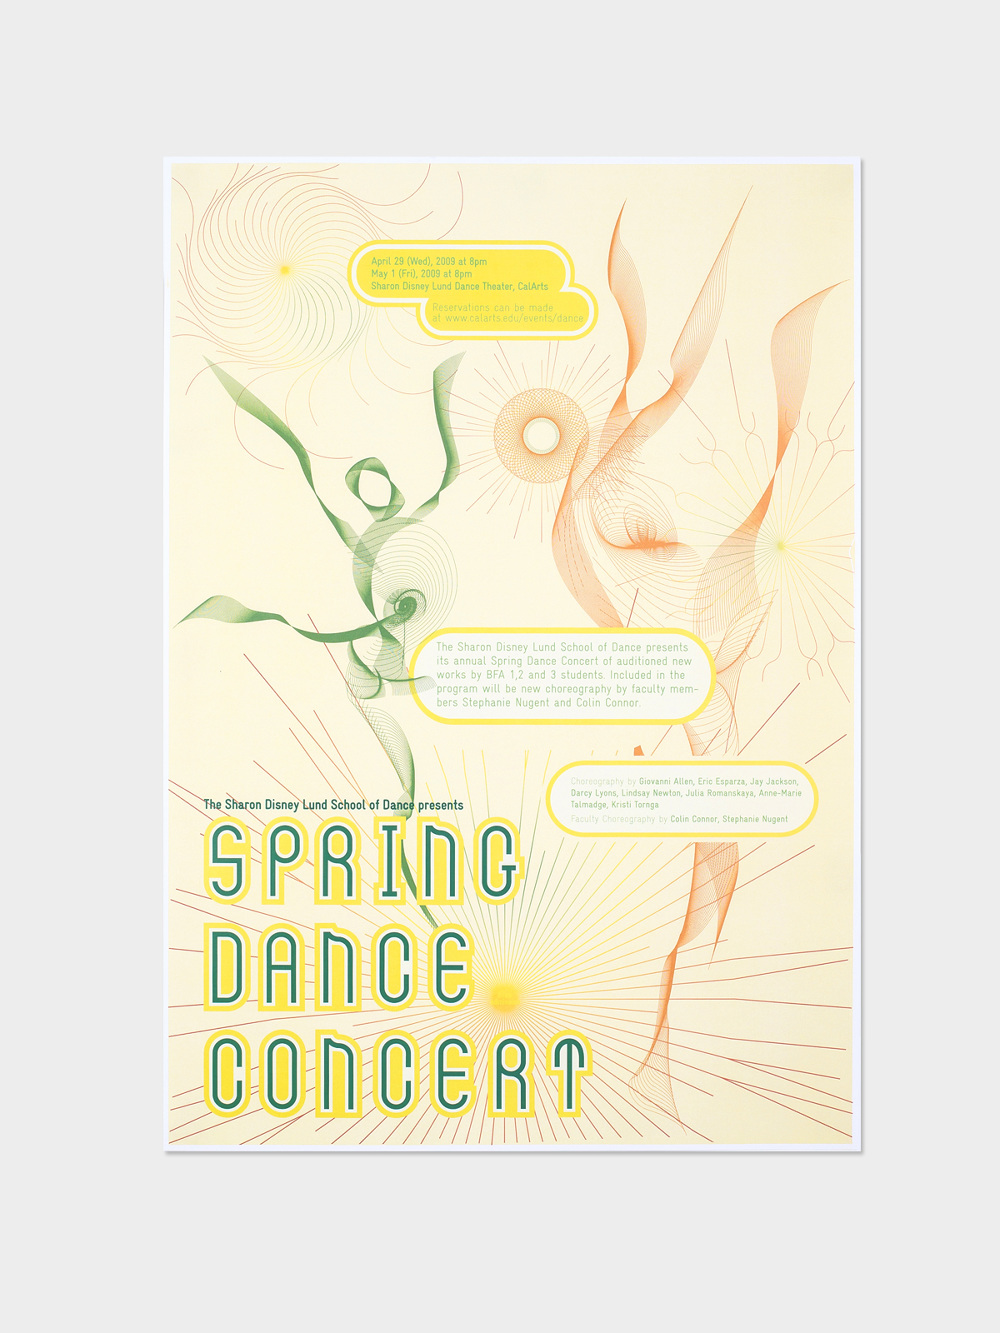 Spring Dance Concert - seanyoon